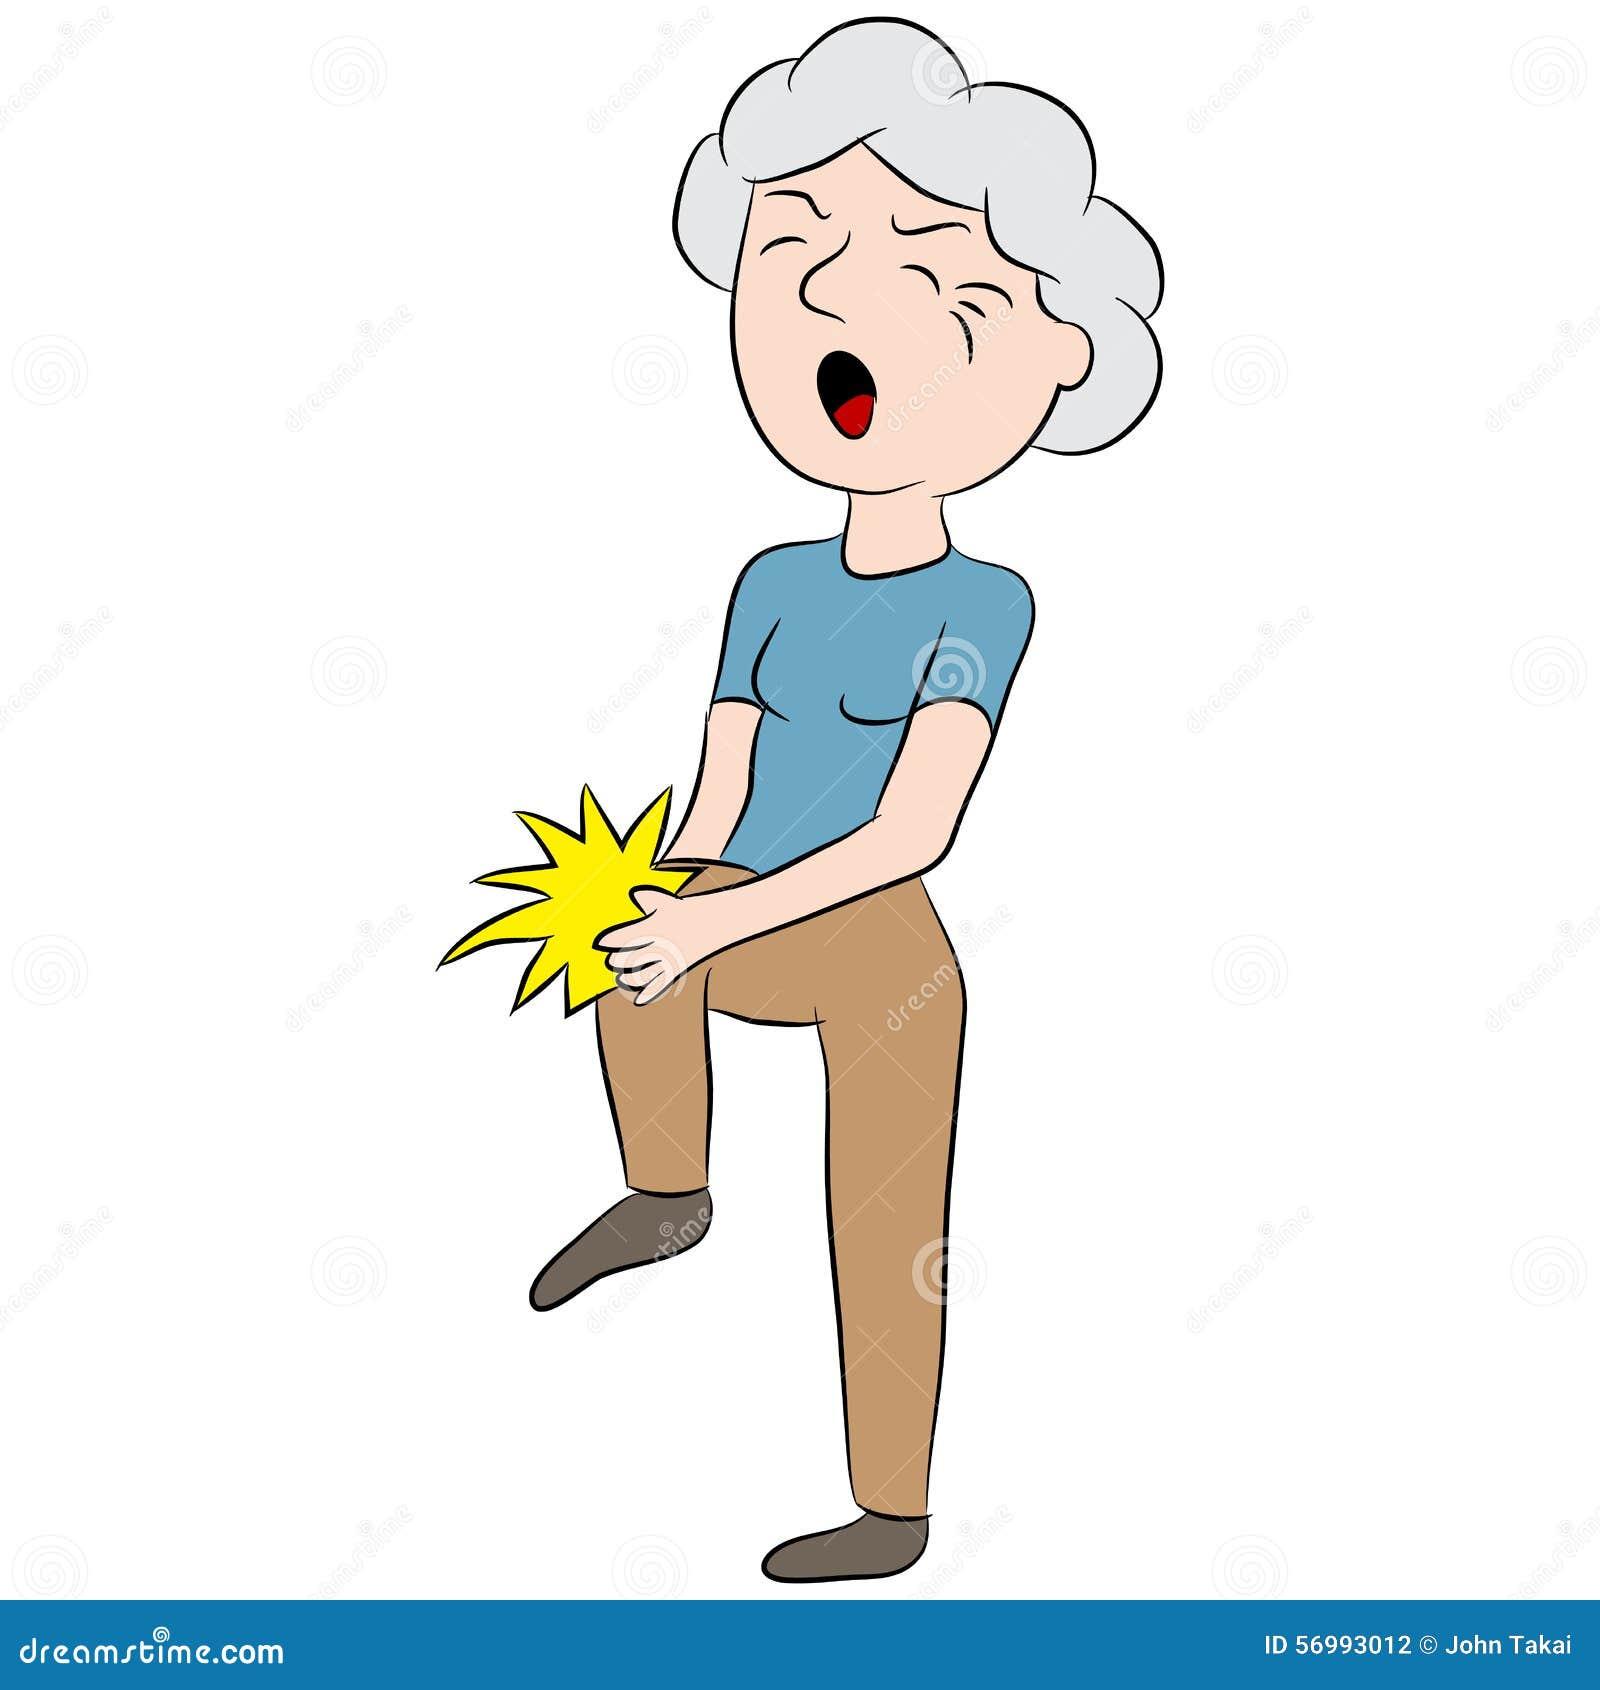 Female Senior Citizen With Knee Pain Stock Vector - Image: 56993012